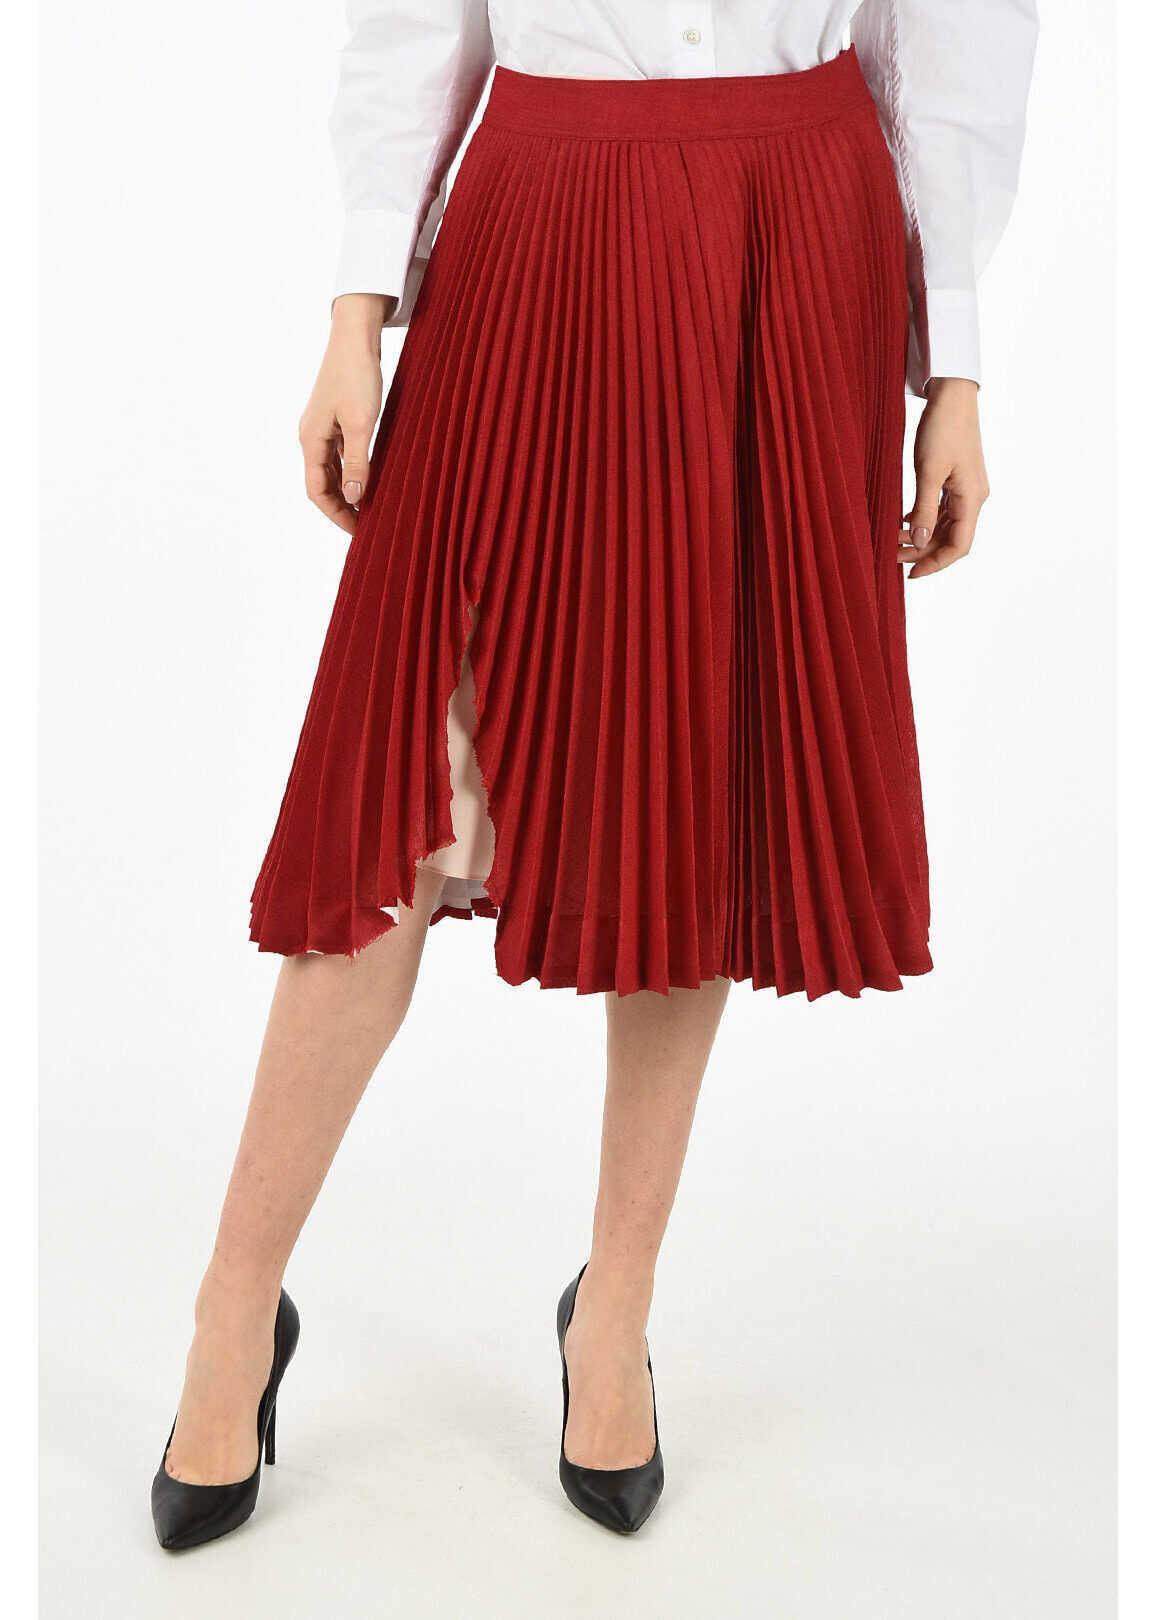 Calvin Klein 205W39NYC vintage effect accordion skirt RED